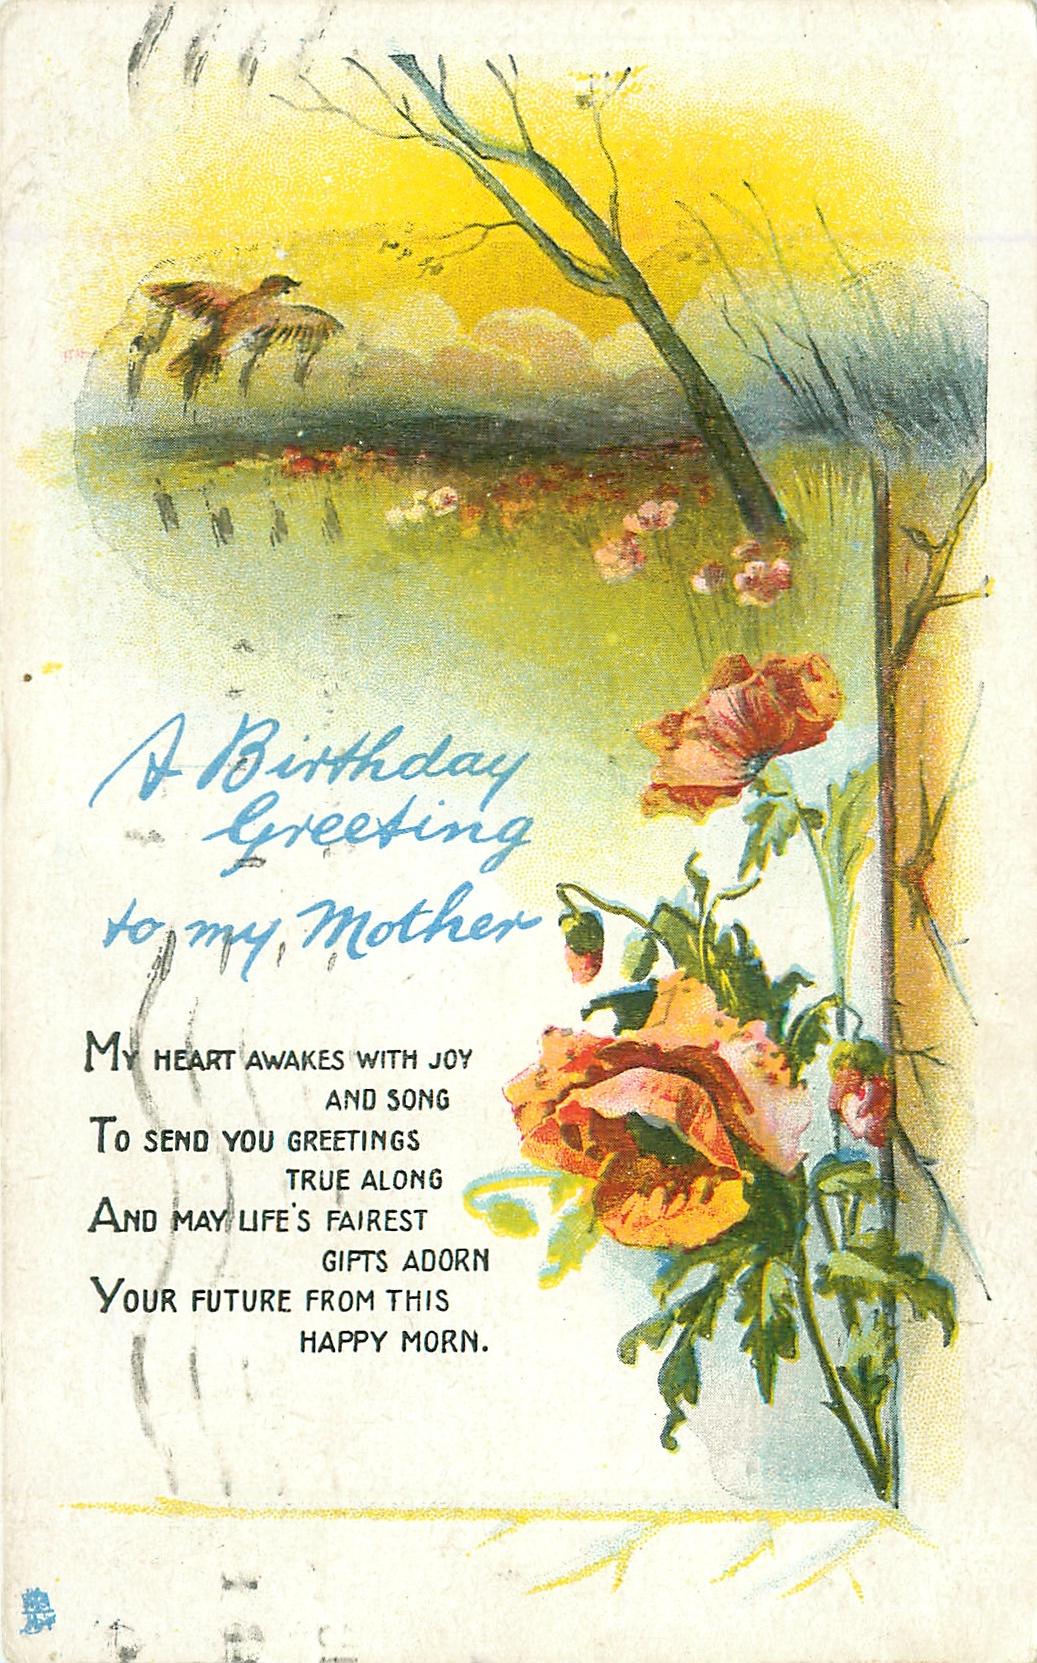 A Birthday Greeting To My Mother Poppies Meadow Skylark Tuckdb